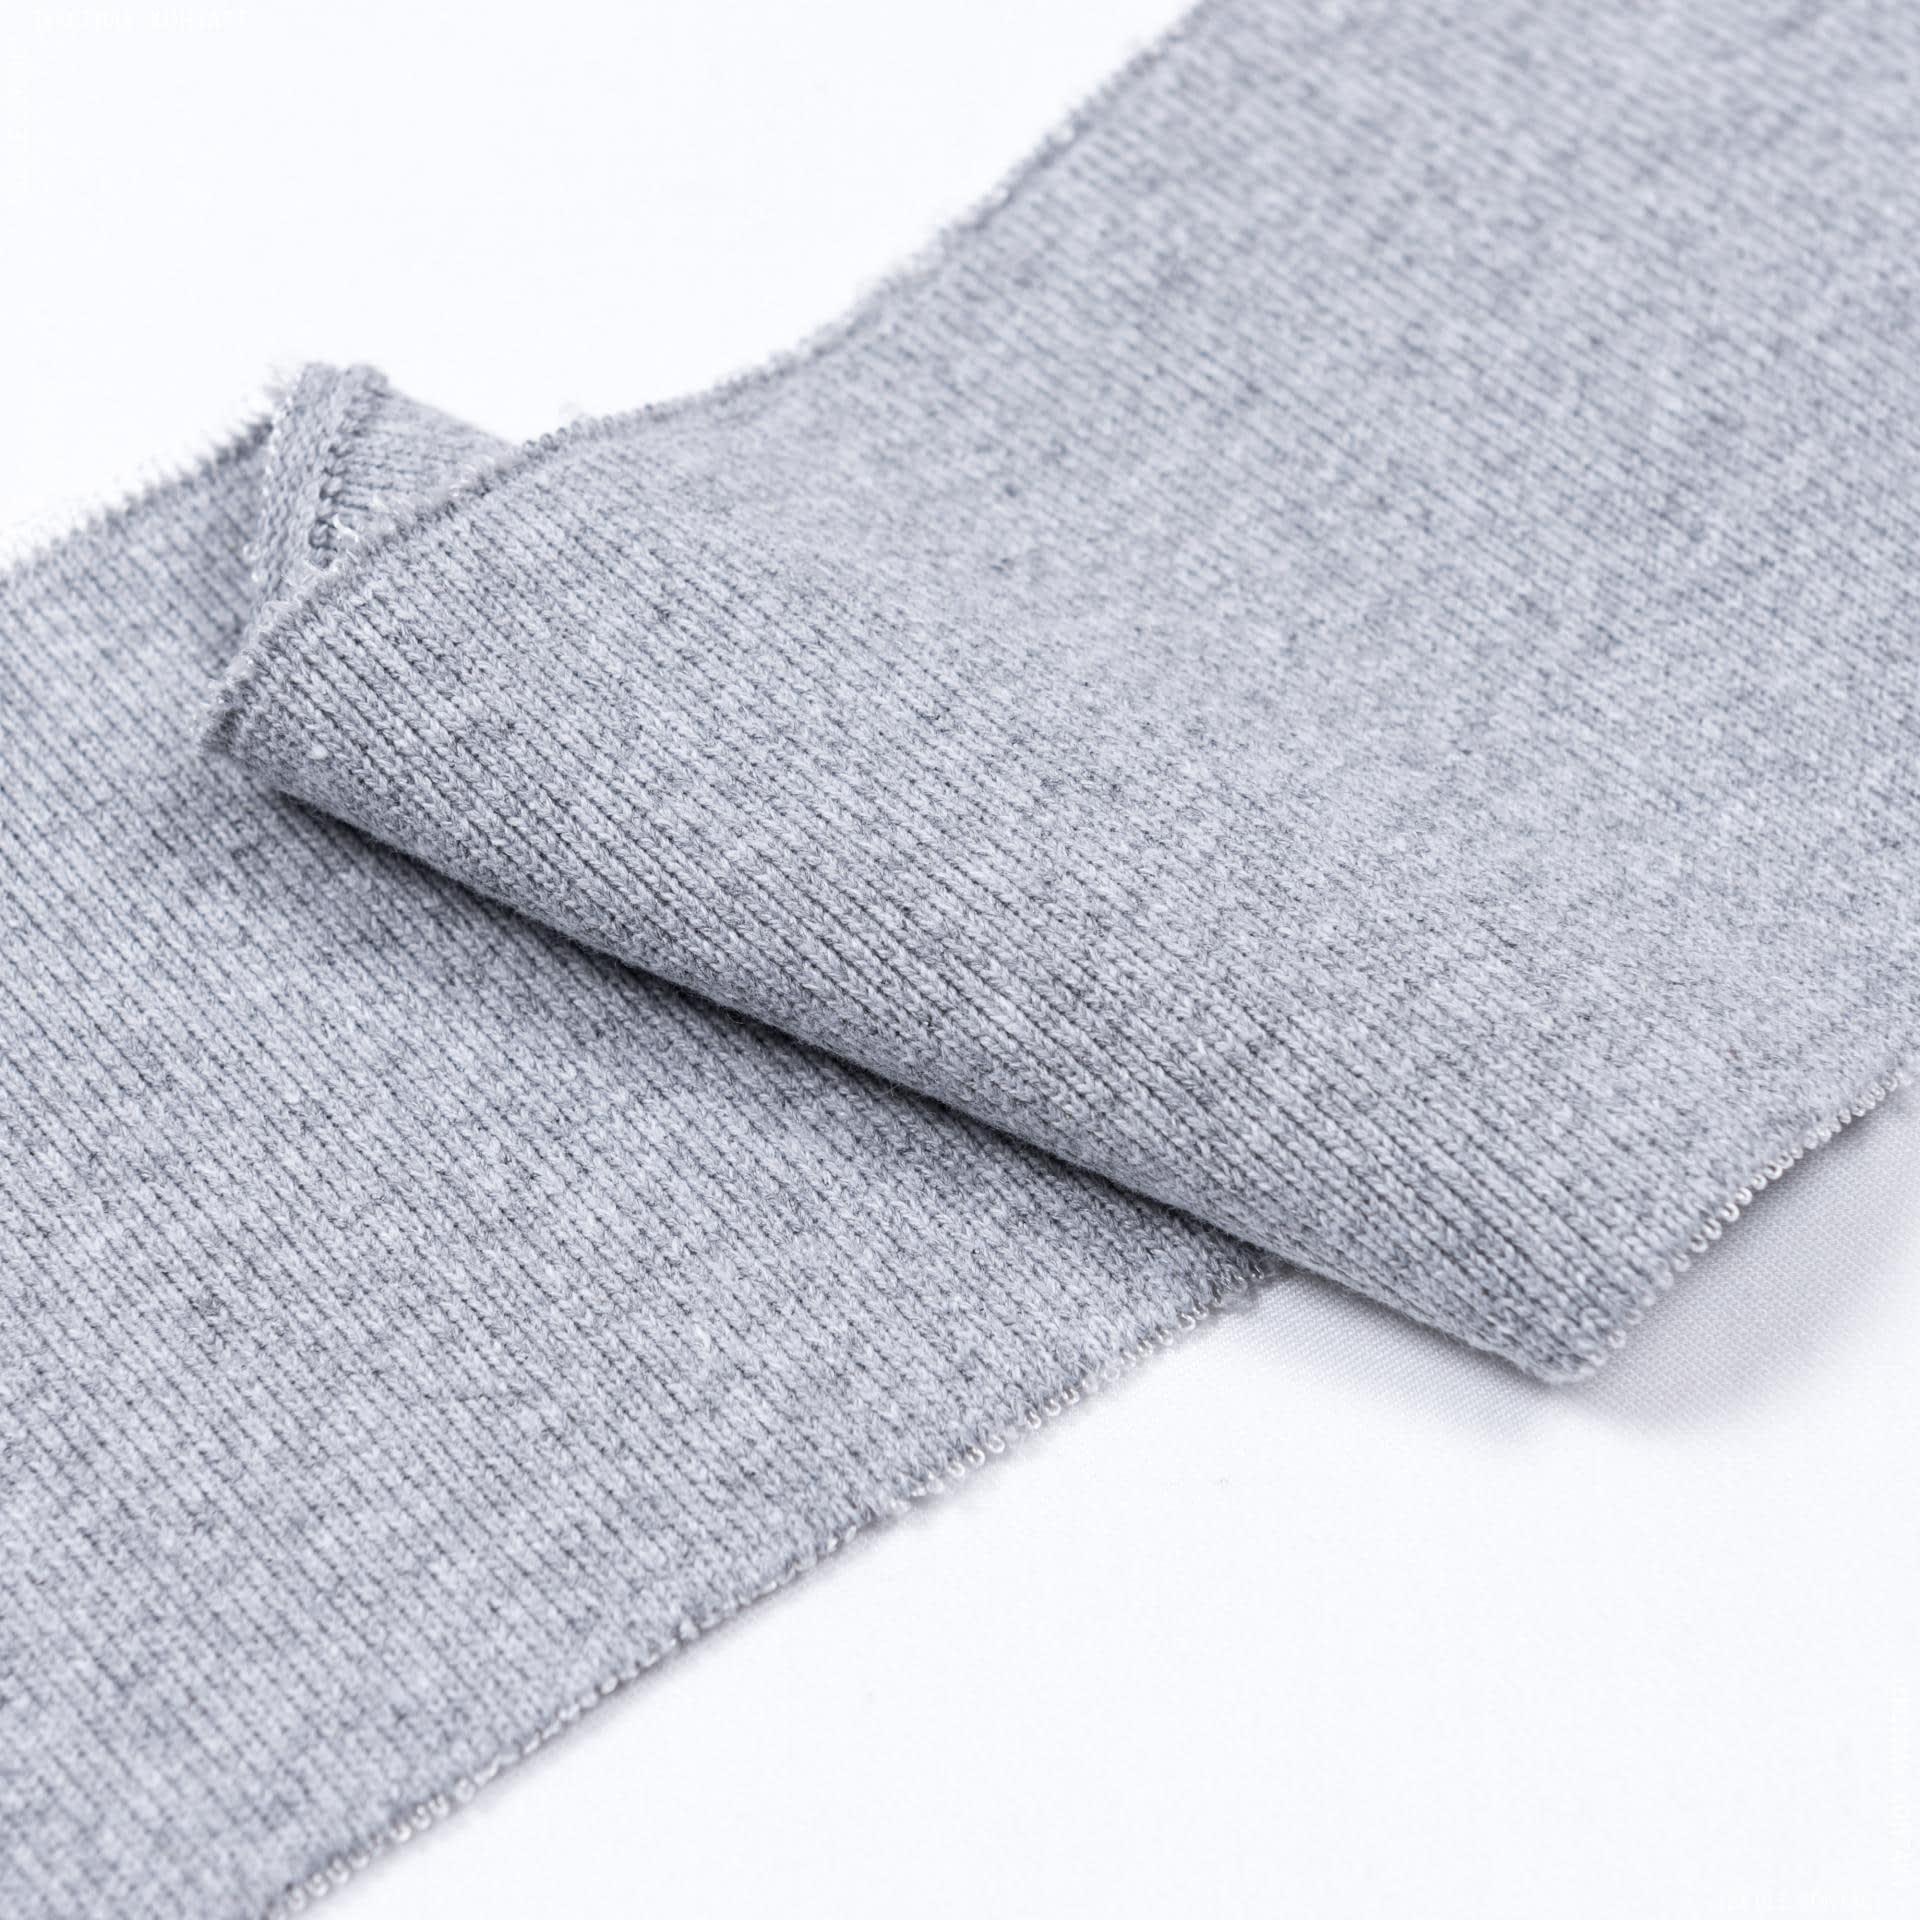 Ткани трикотаж - Воротник- манжет  серый/меланж   10 х 42 (к арт 157809)